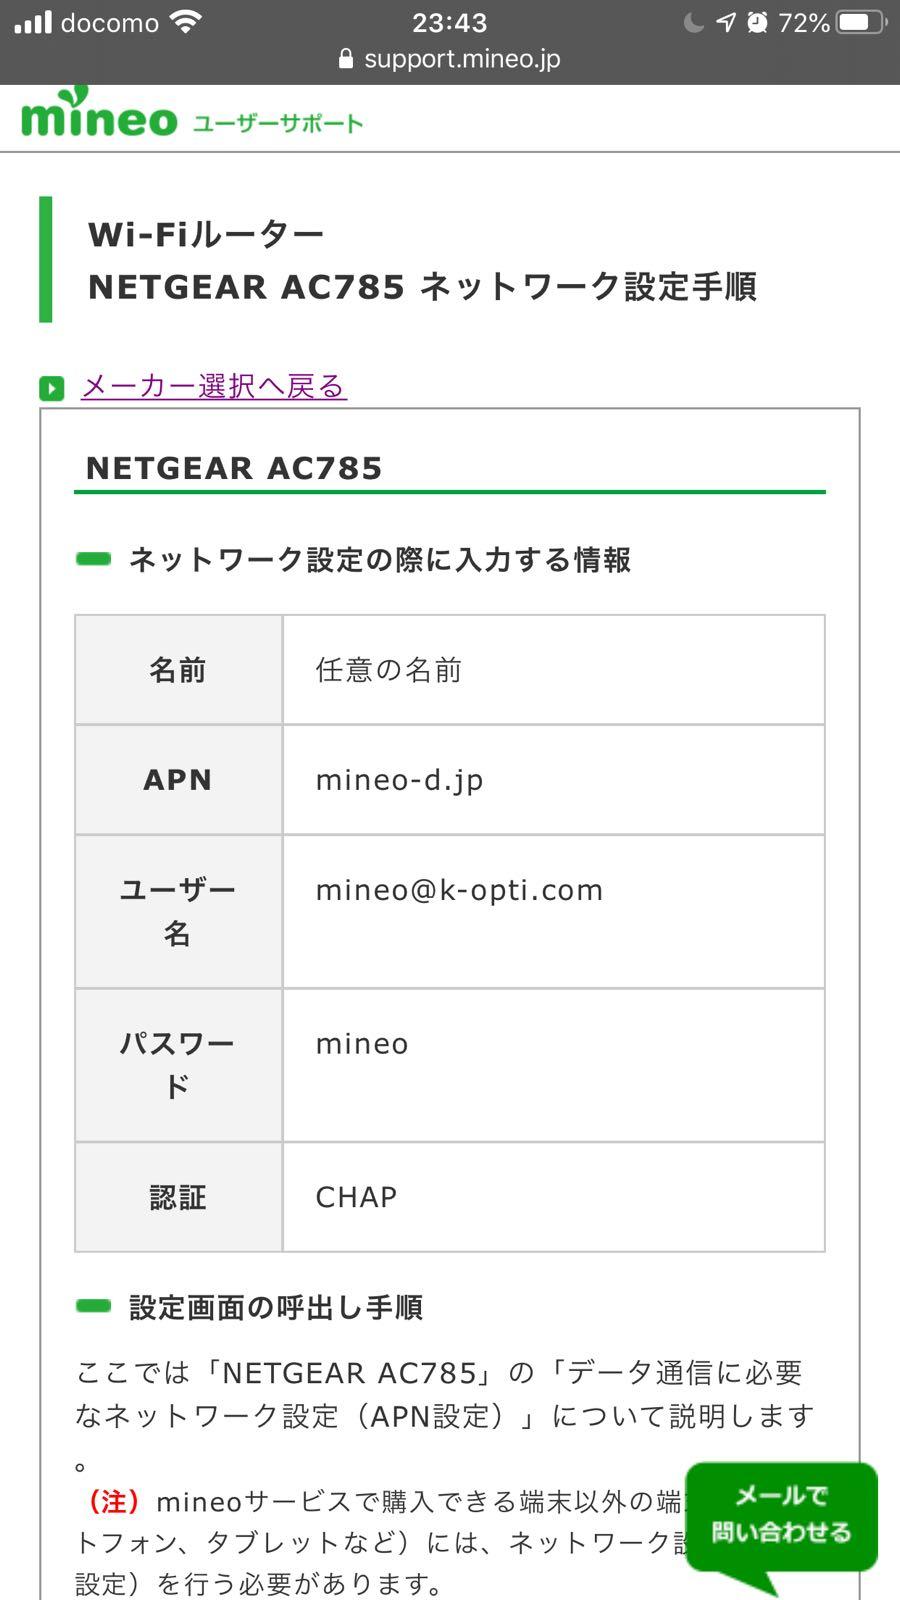 NETGEARとmineoで常時接続環境構築